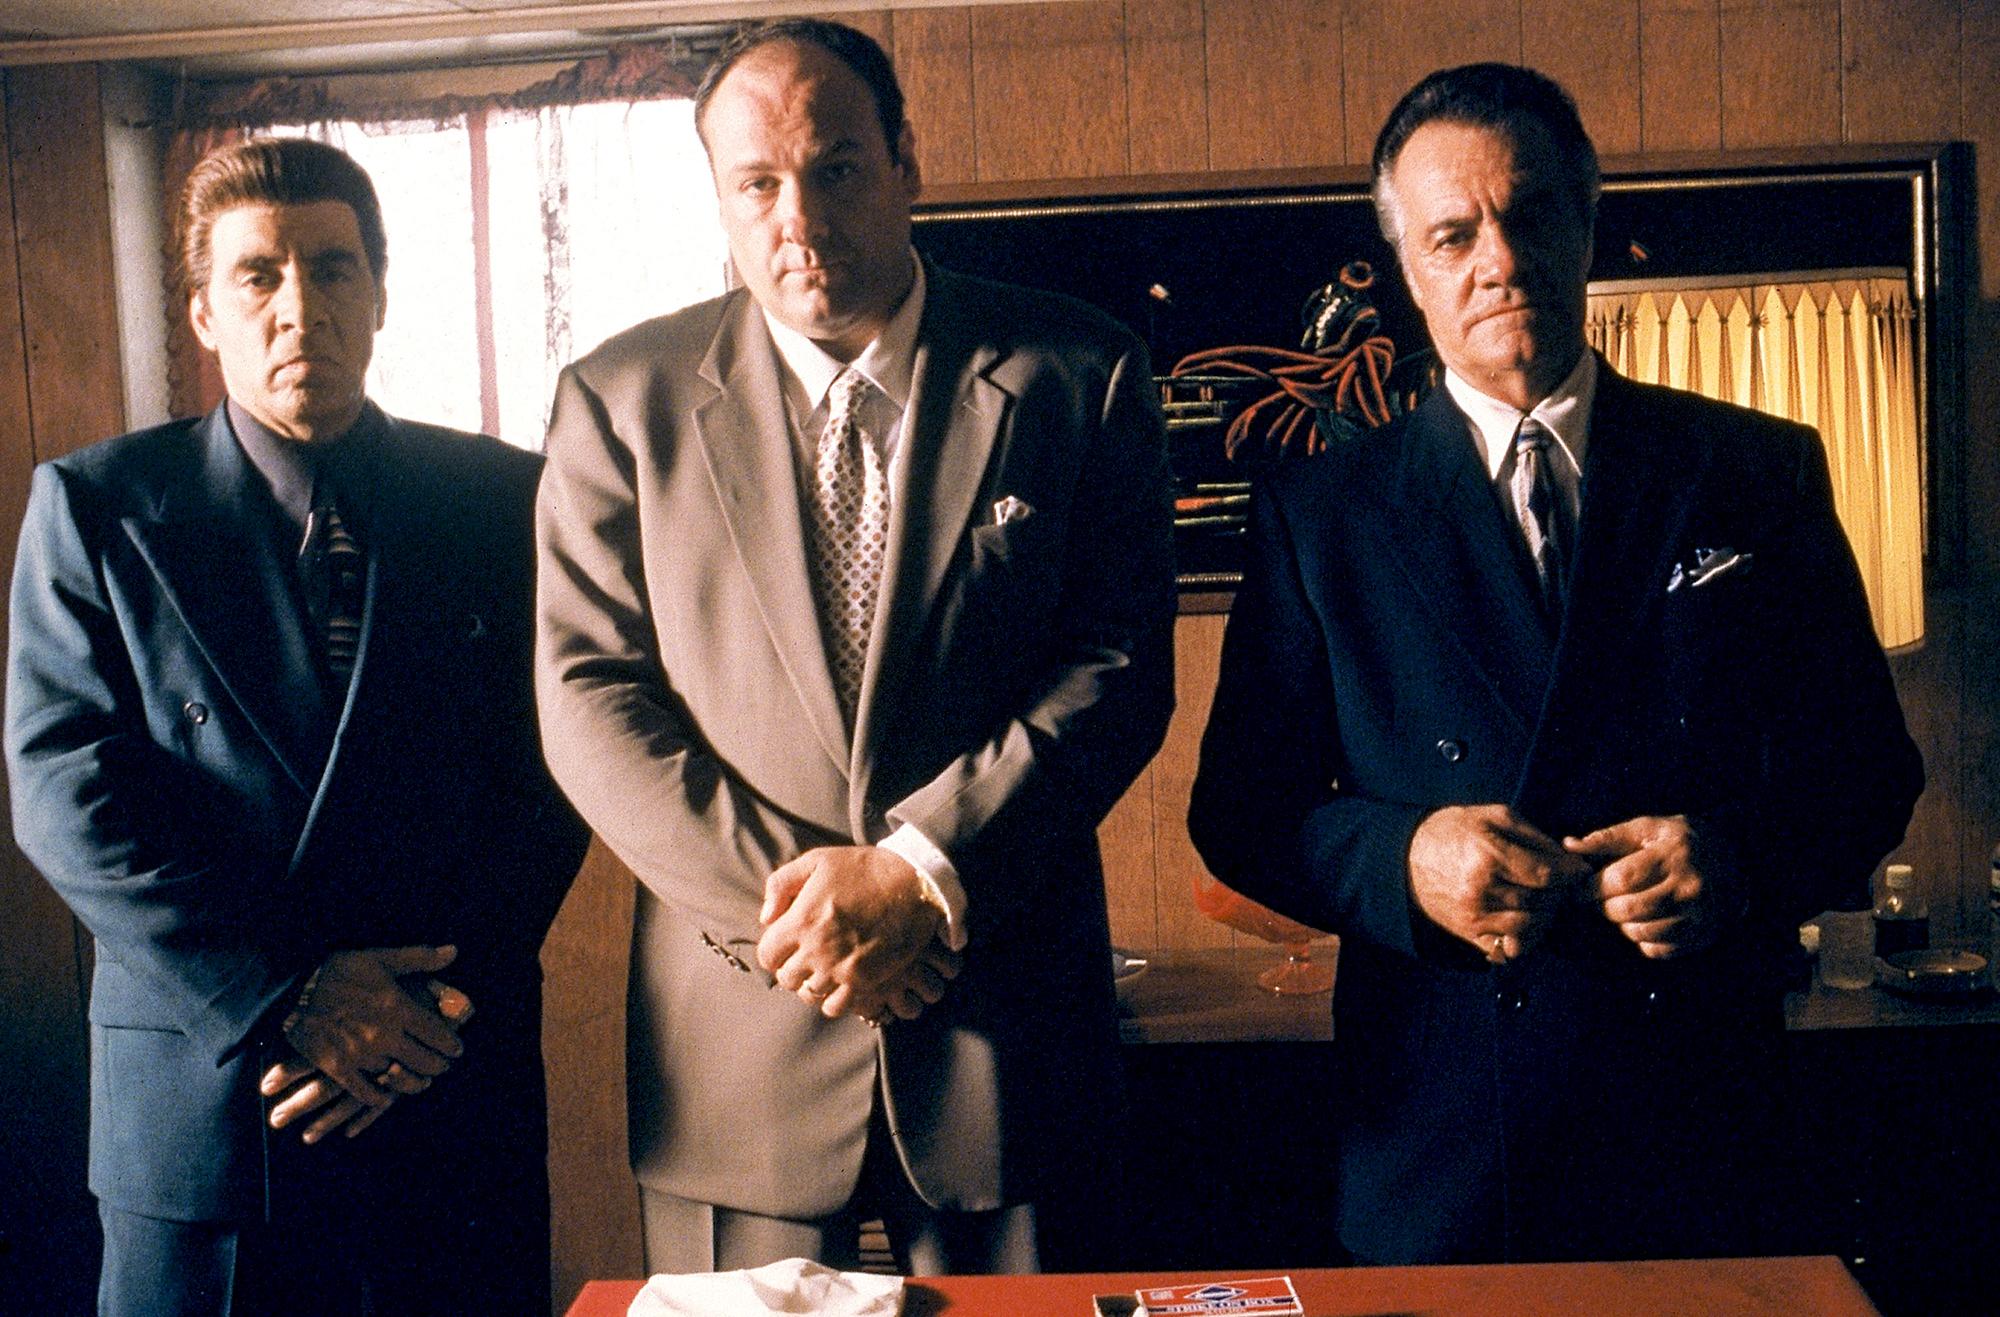 'Sopranos' Stars Steve Schirripa and Michael Imperioli React to Prequel News and James Gandolfini's Son Playing Tony